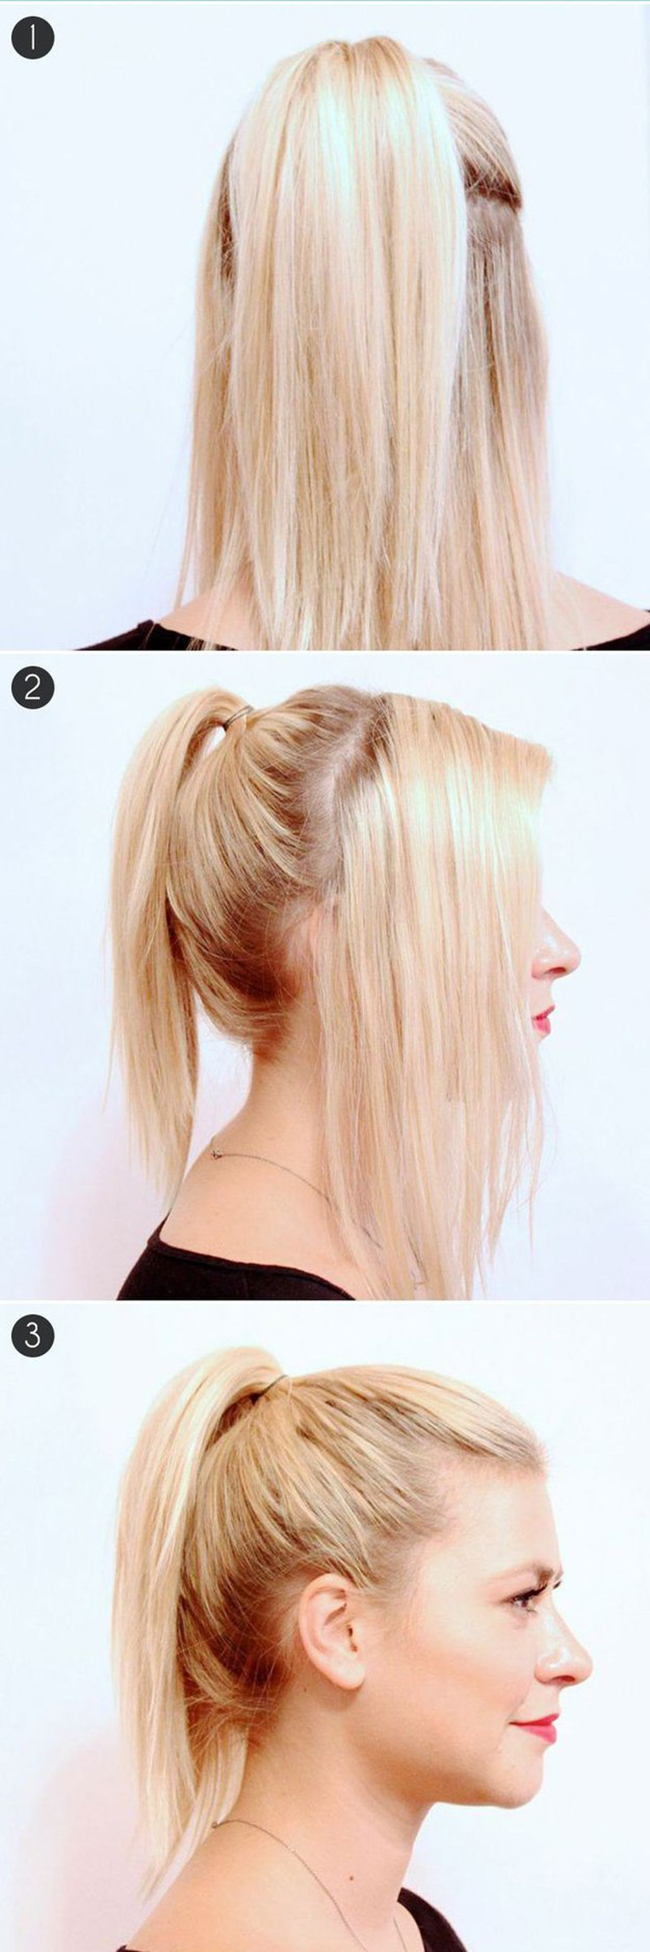 Formas de peinados para cabello corto